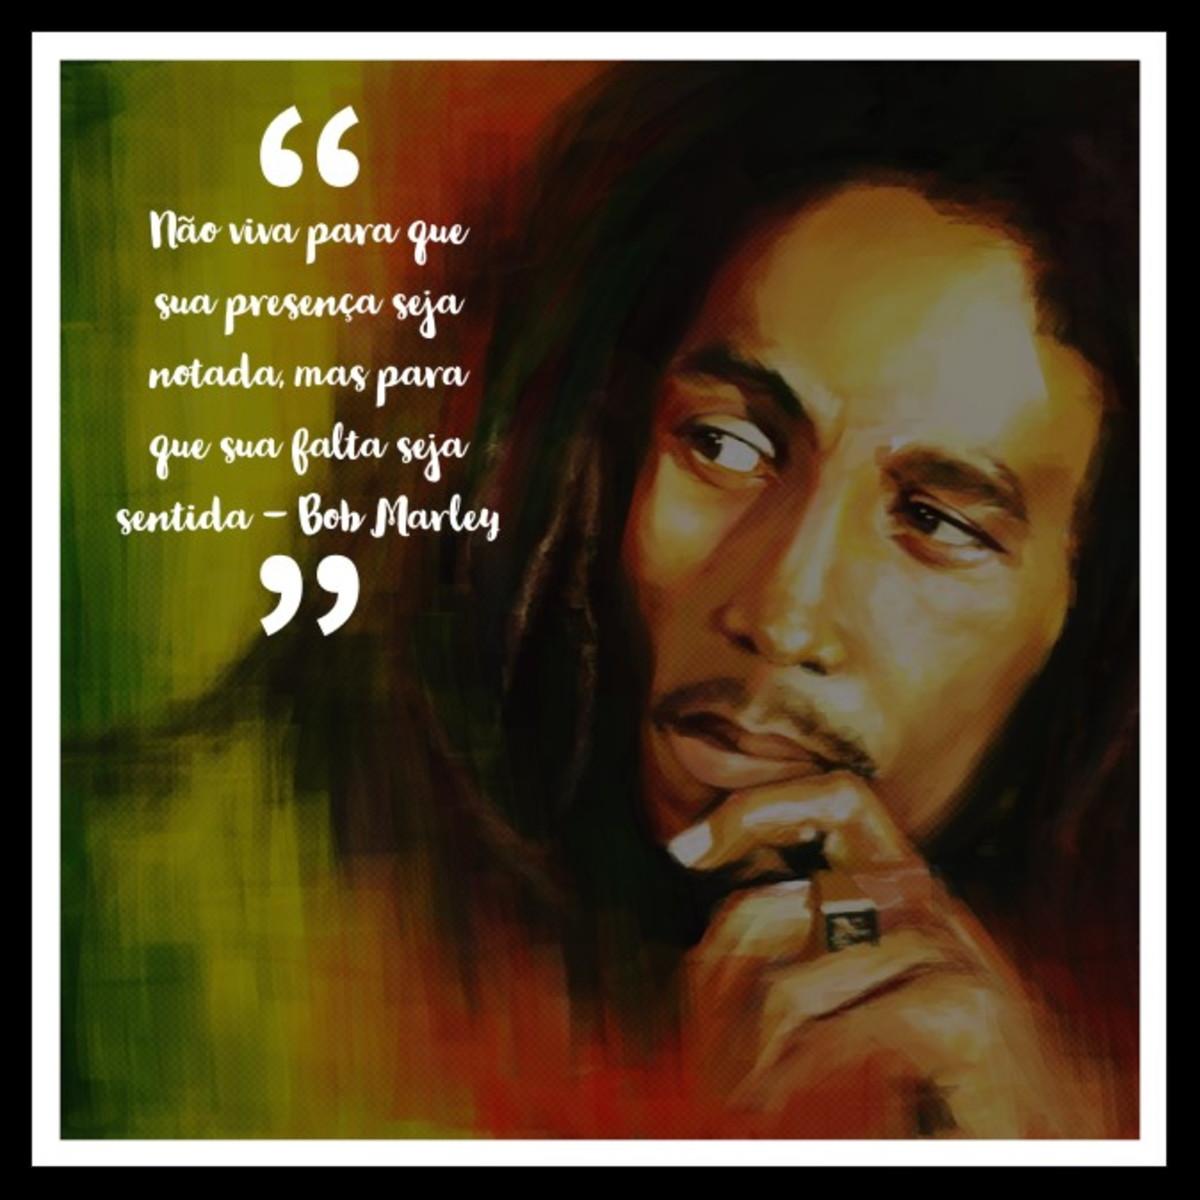 Quadro Seja Sentida Por Bob Marley